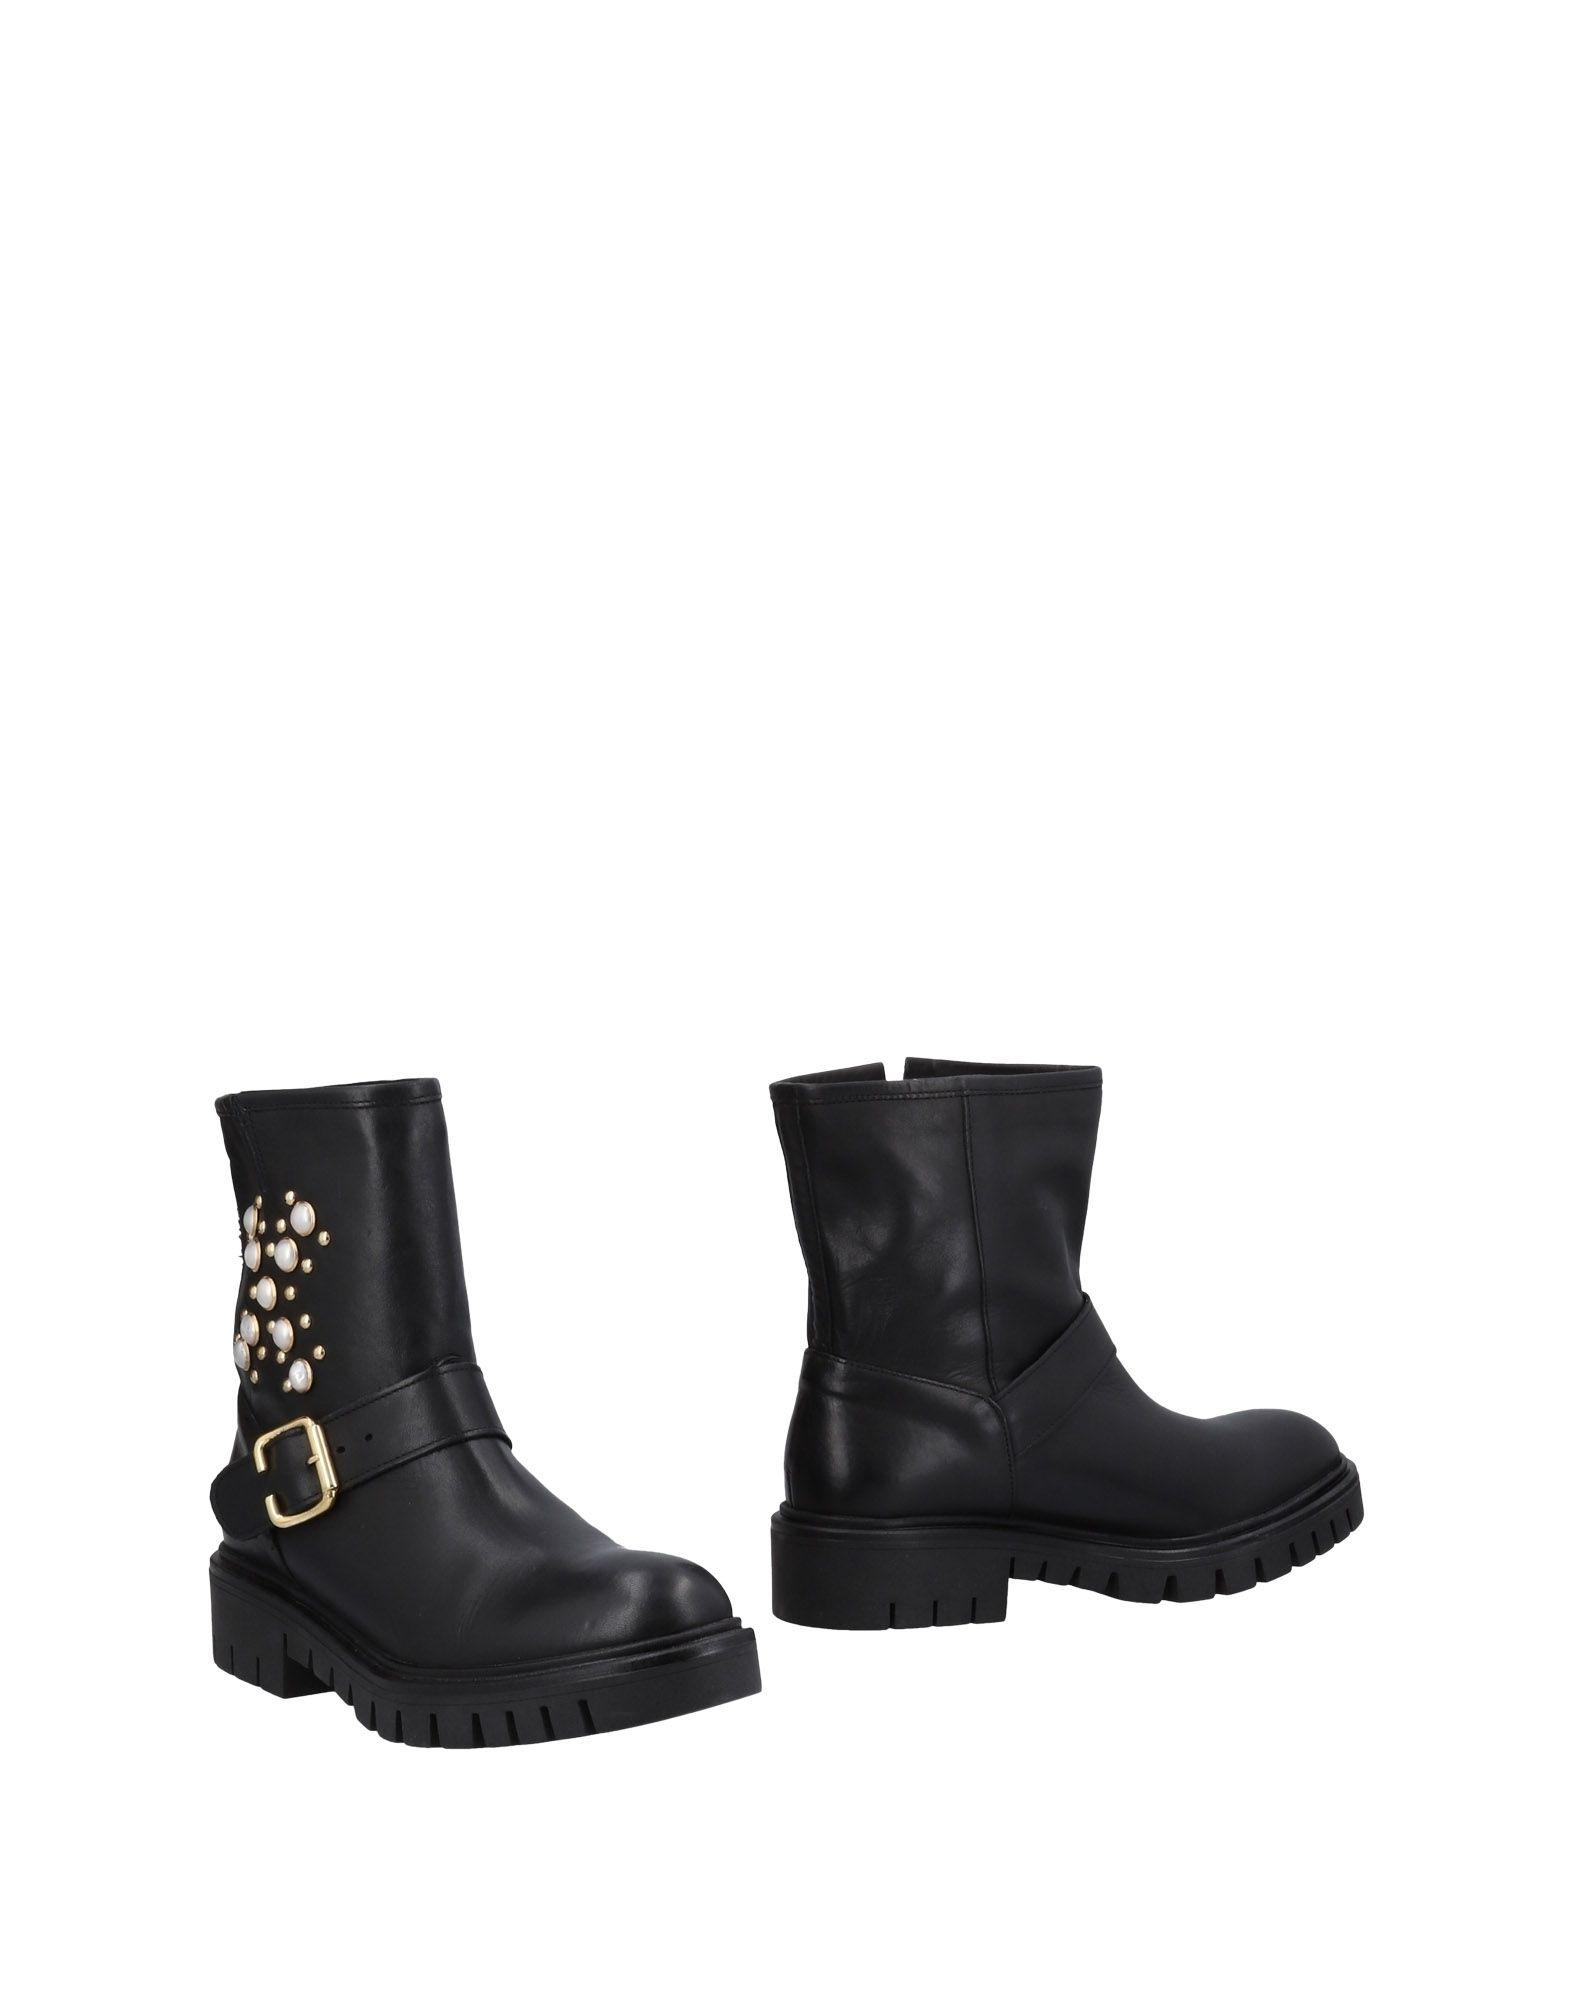 LORETTA PETTINARI Полусапоги и высокие ботинки boots loretta pettinari ботинки на каблуке